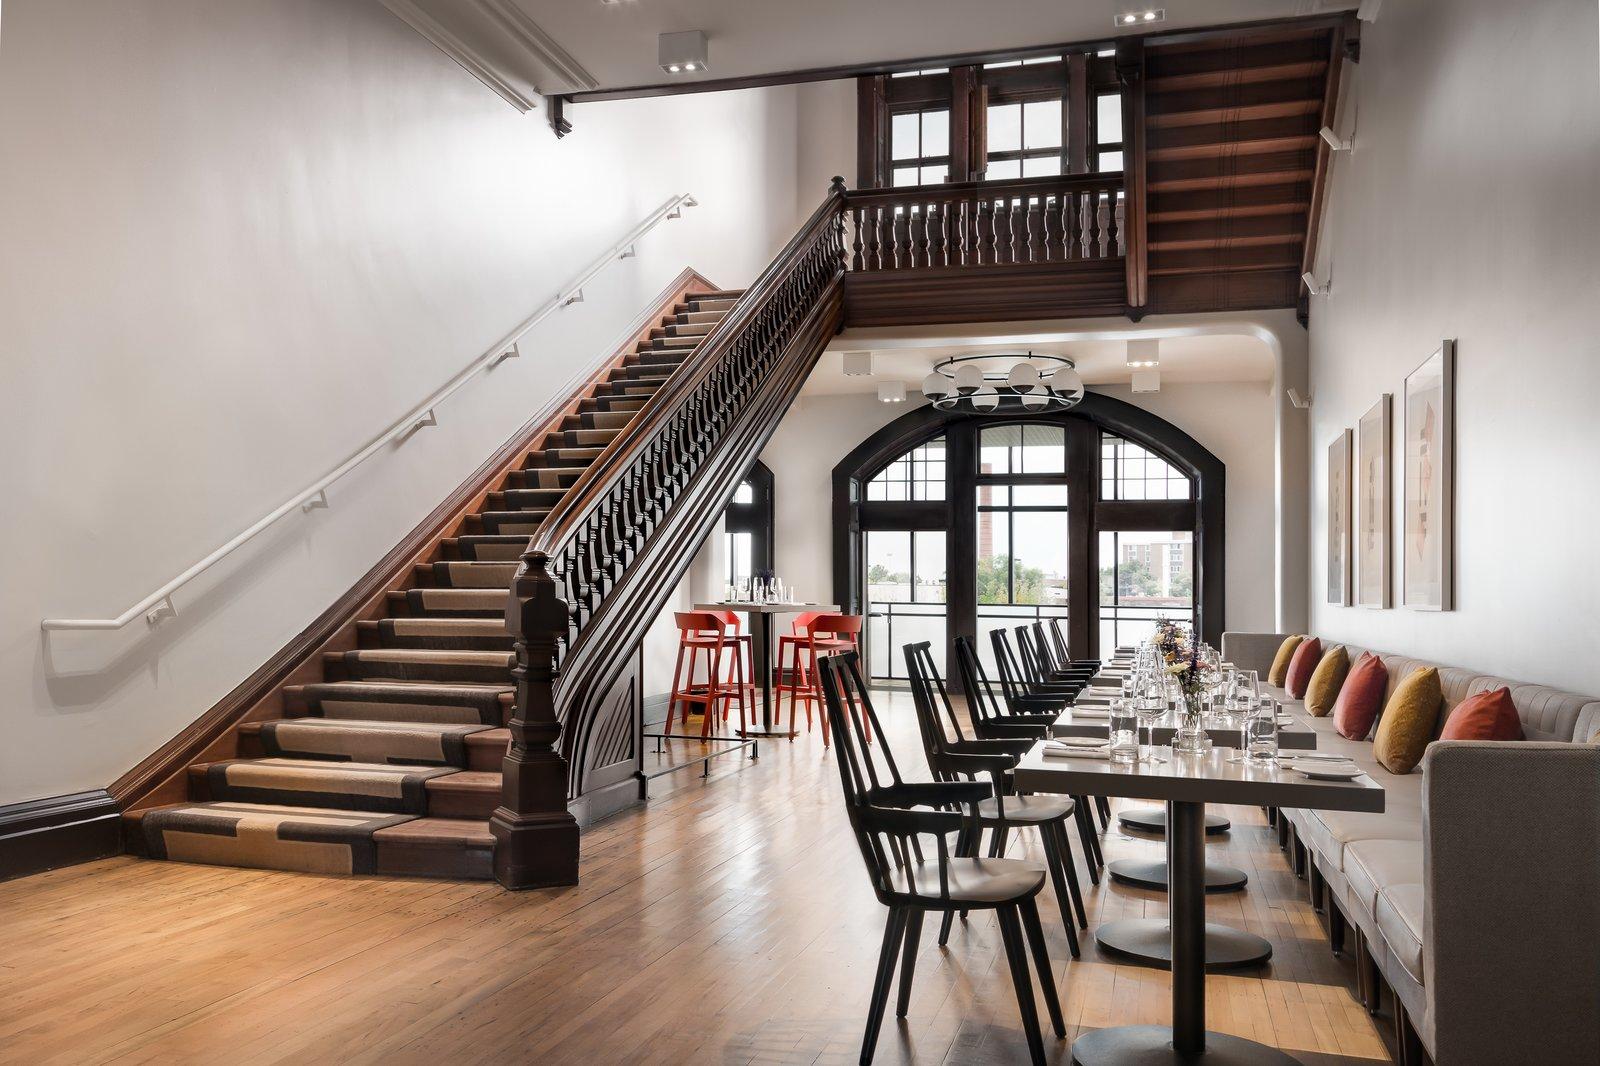 Dining Room 100 Acres Restaurant at Hotel Henry  Hotel Henry Urban Resort at Richardson Olmsted Campus